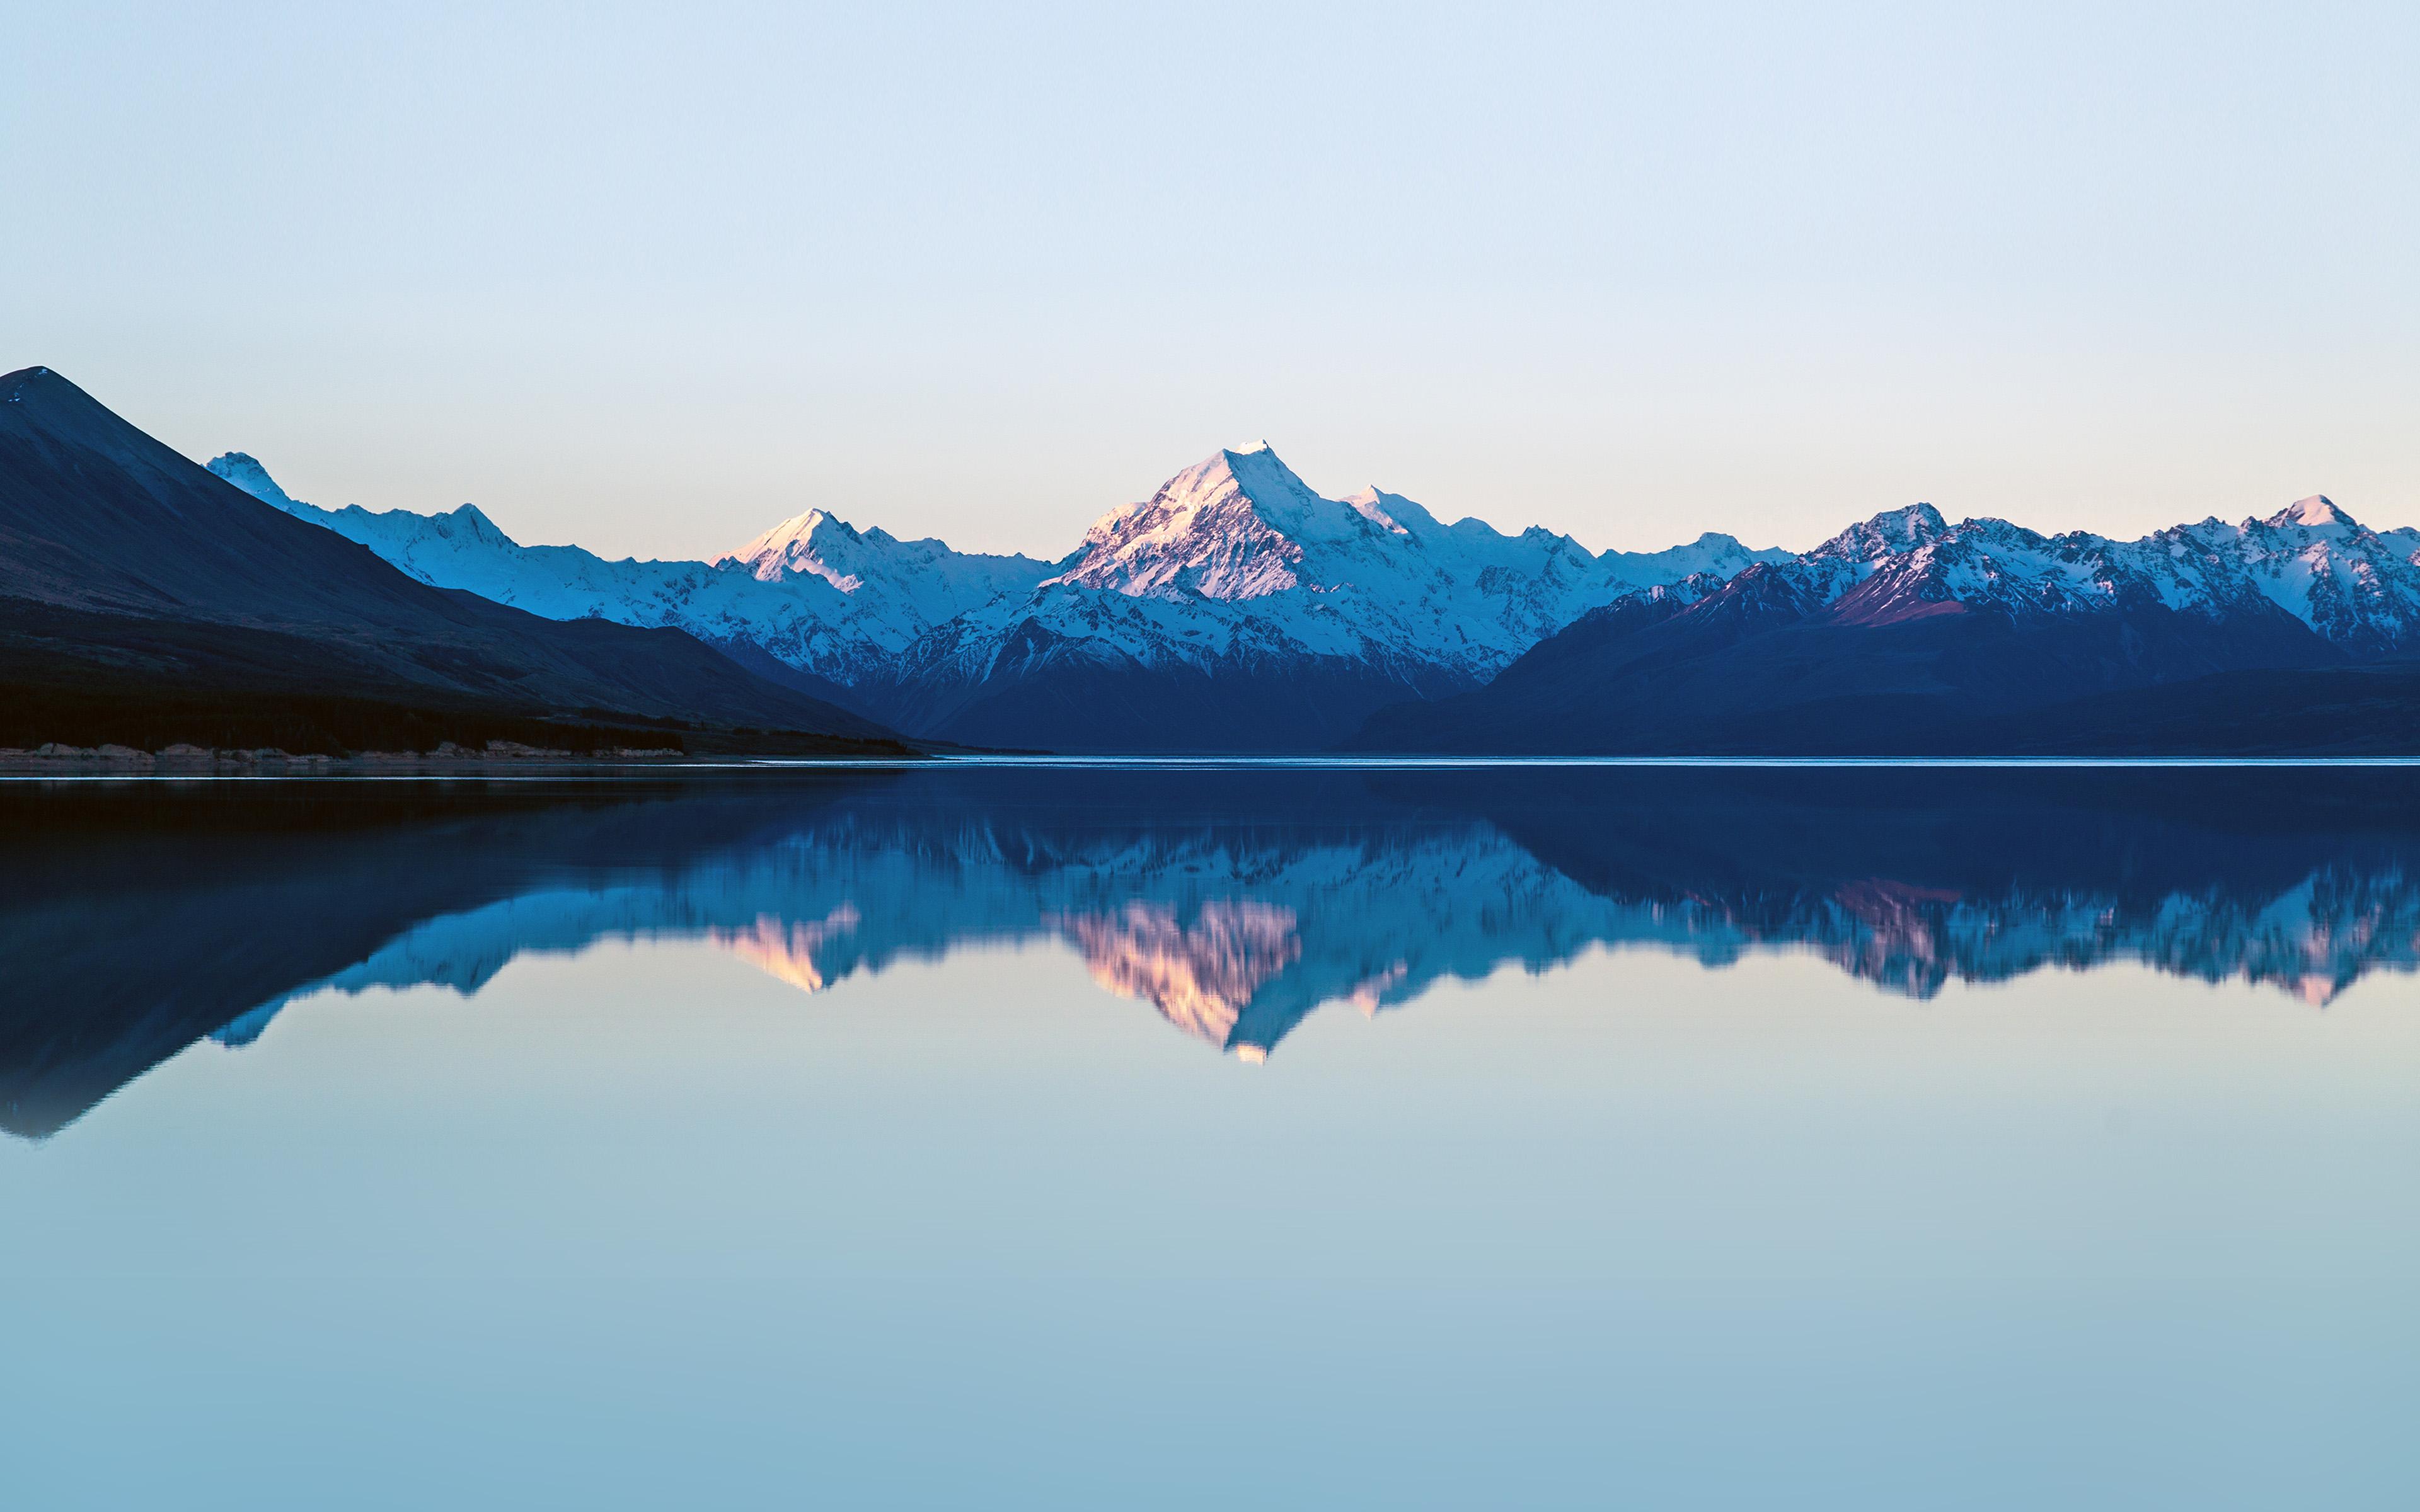 Lake Mountain Reflection Minimalism Wallpapers Hd: Mu27-reflection-lake-blue-mountain-water-river-nature